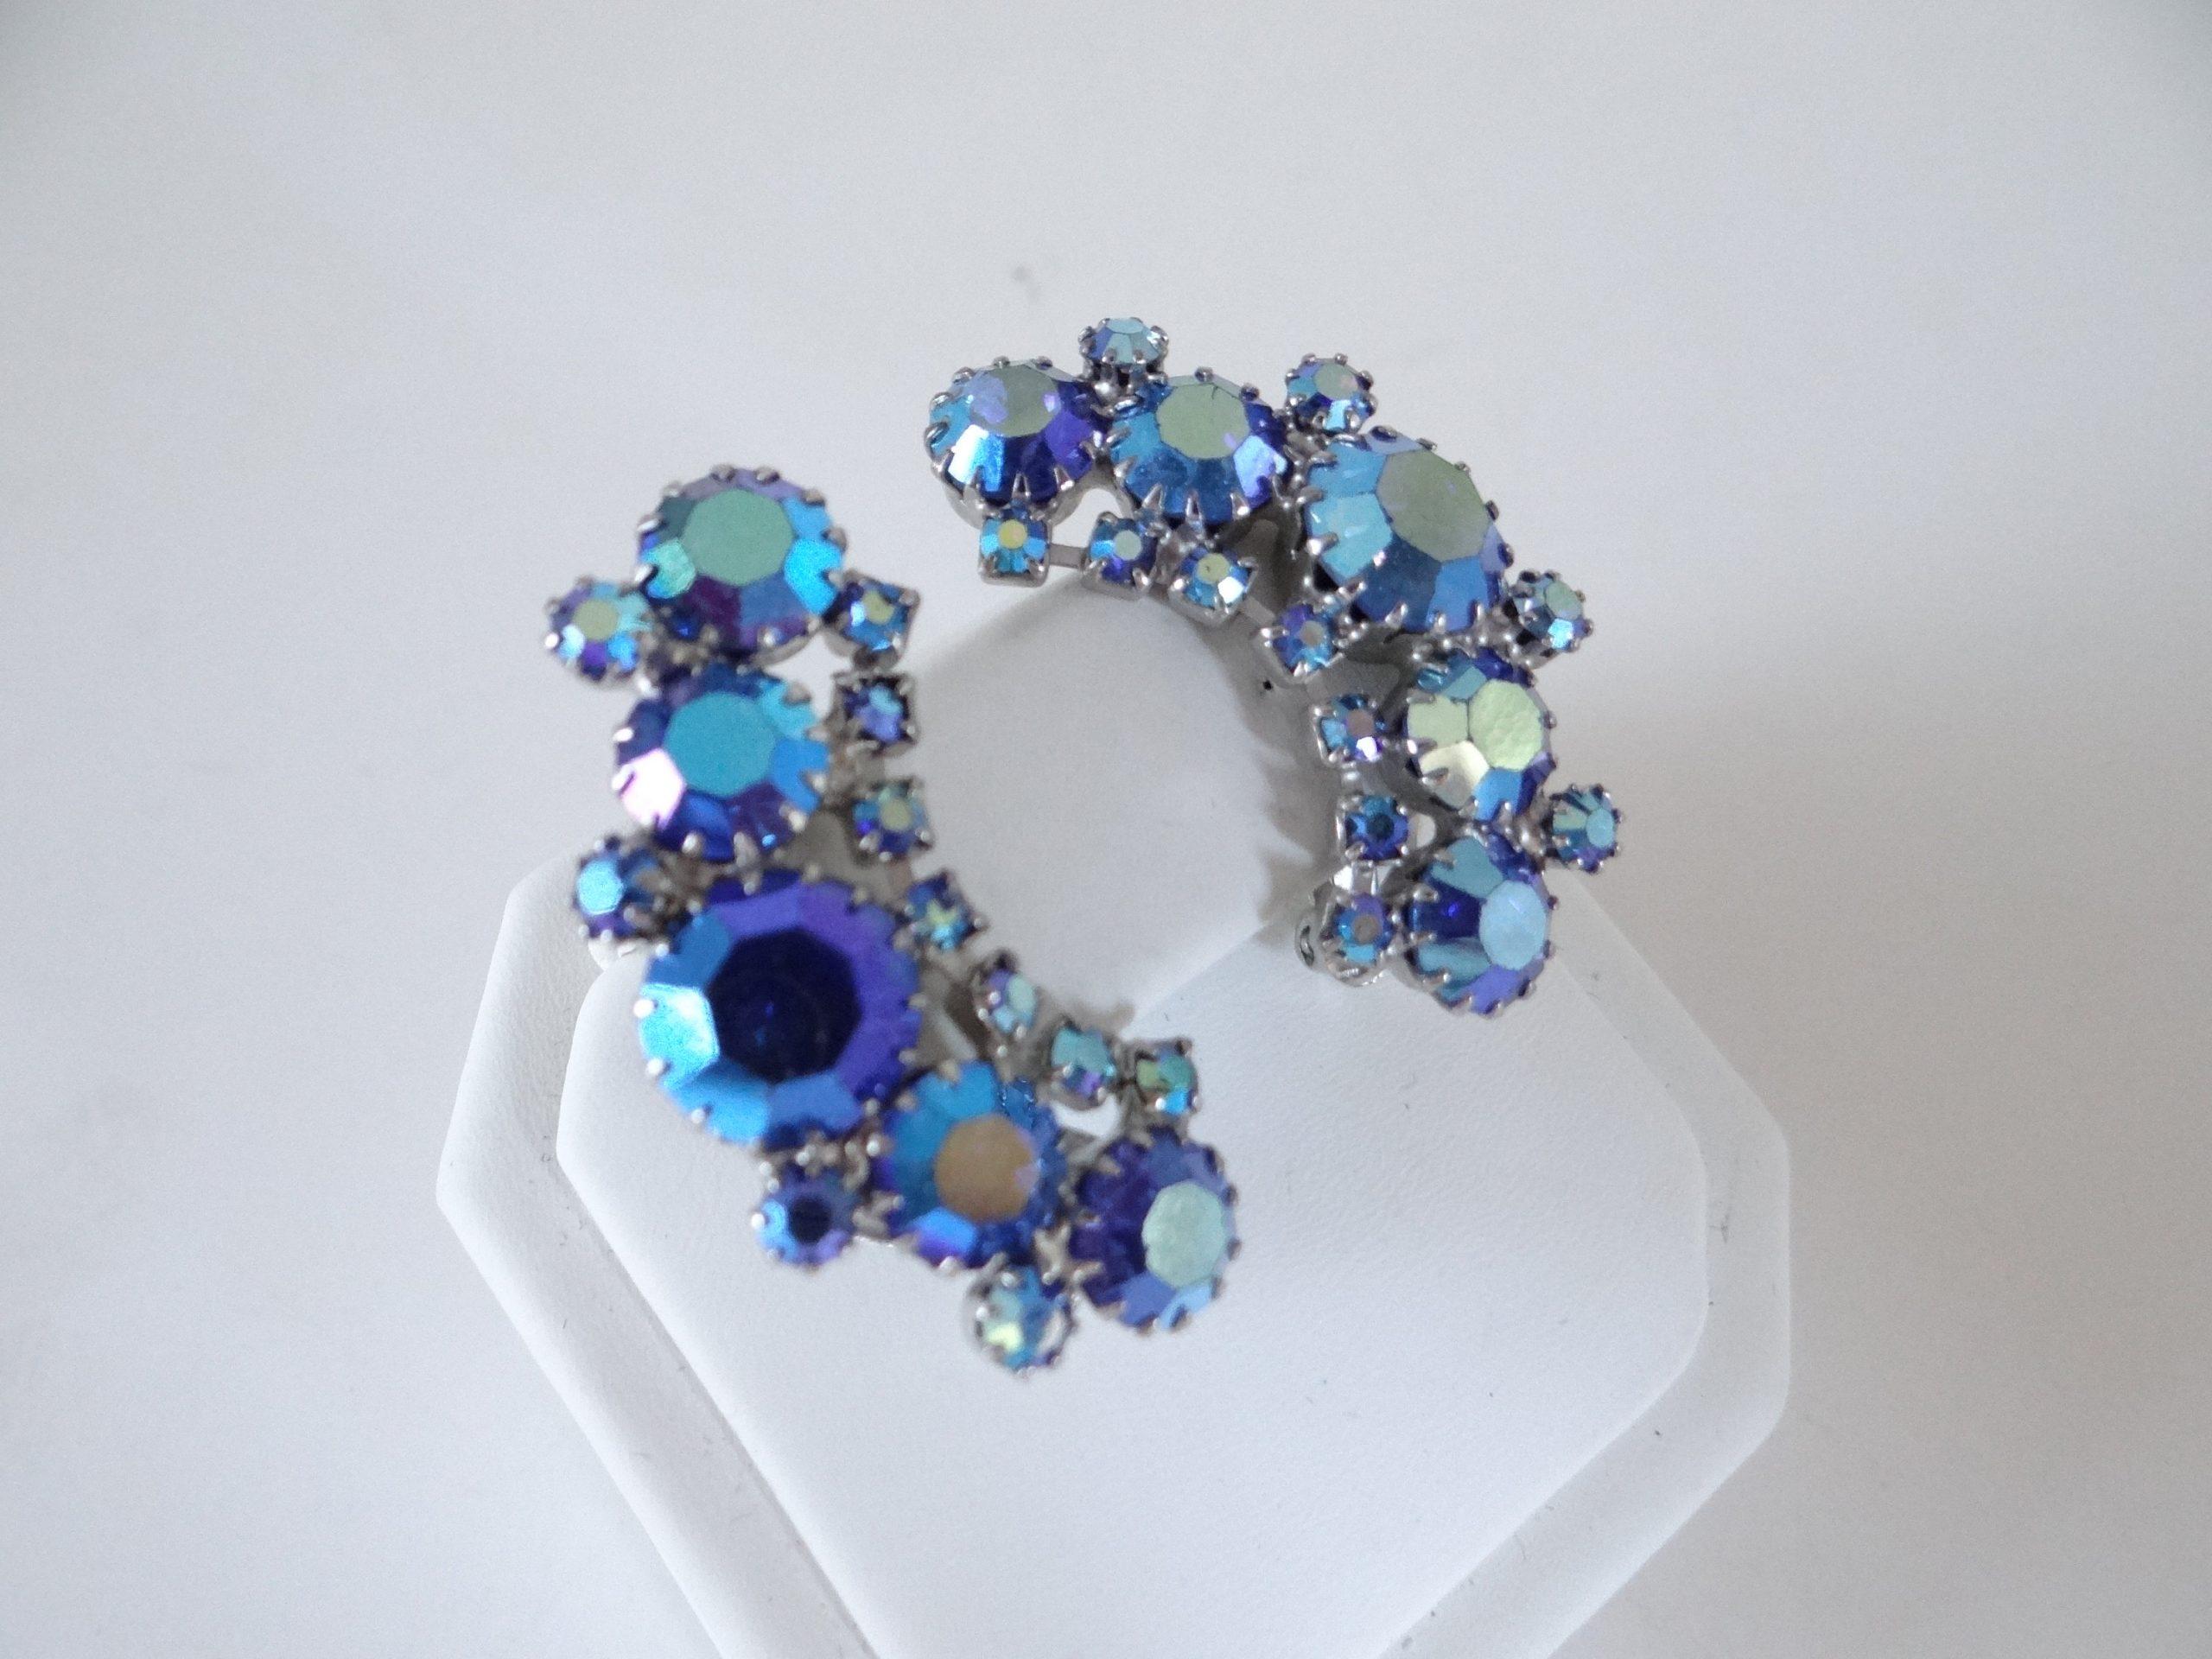 Vintage cobalt blue aurora borealis bead brooch and clip on earrings jewelry set